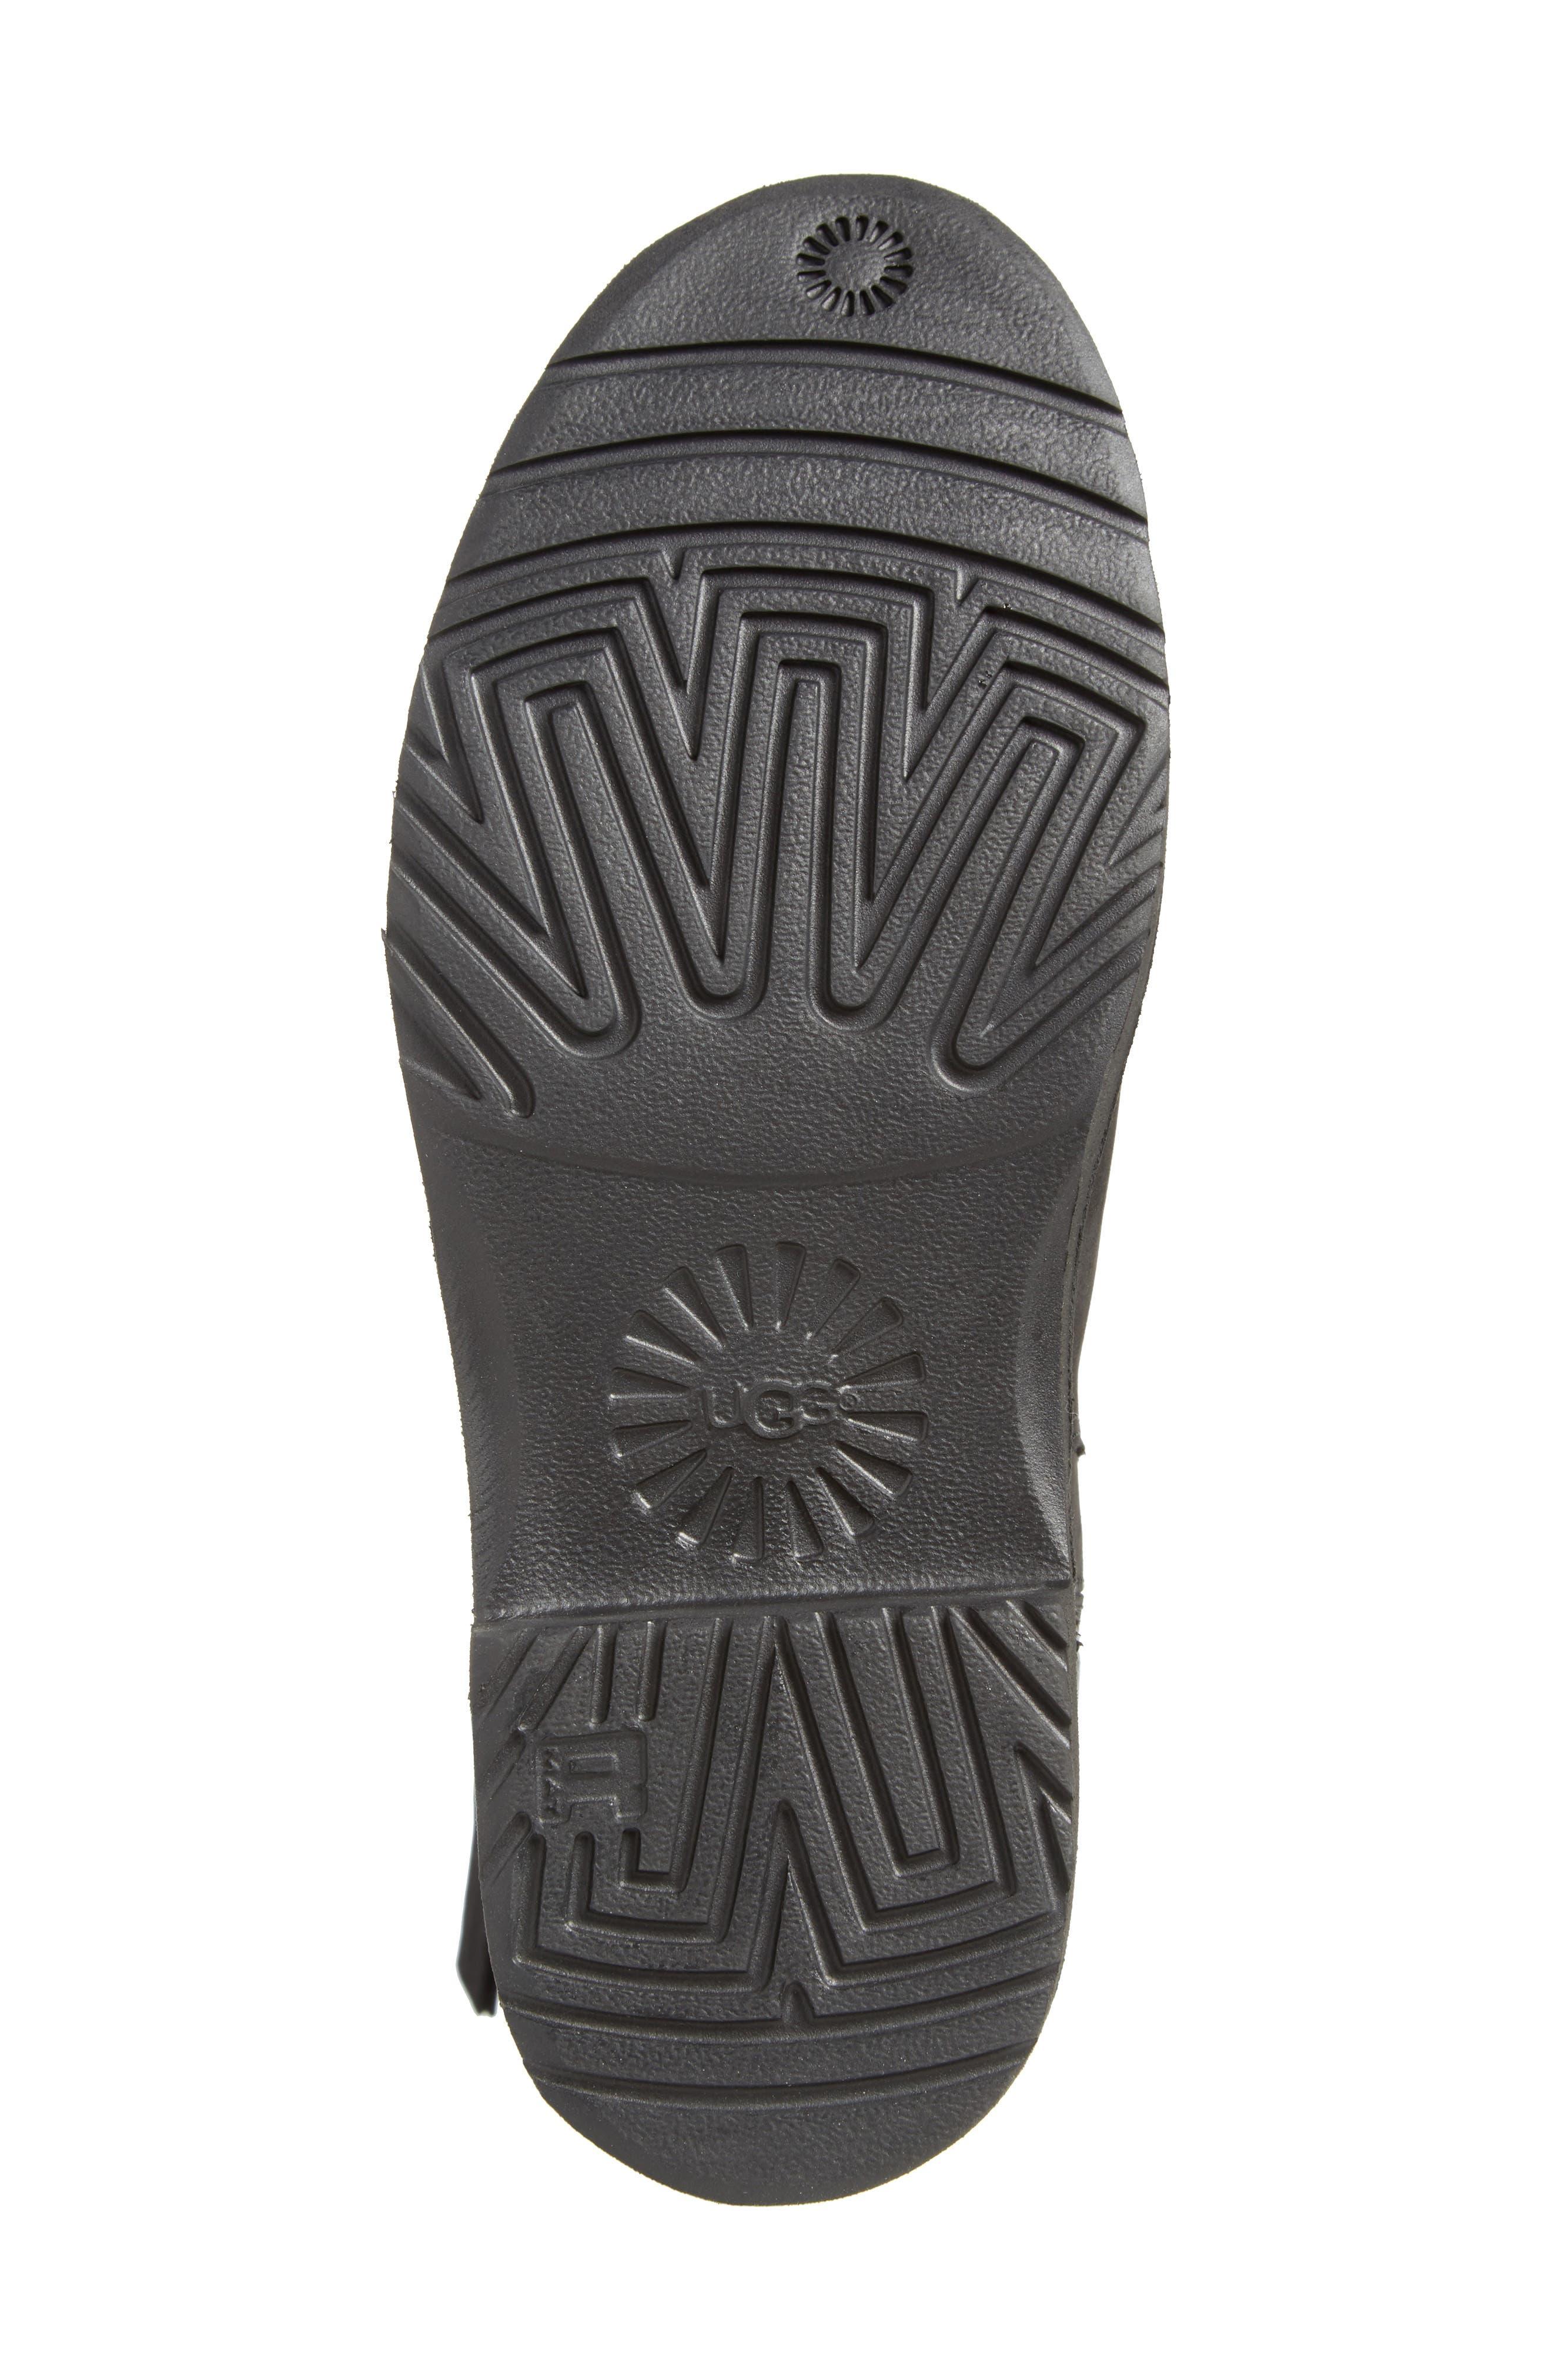 Elly Boot,                             Alternate thumbnail 6, color,                             Black Nubuck Leather